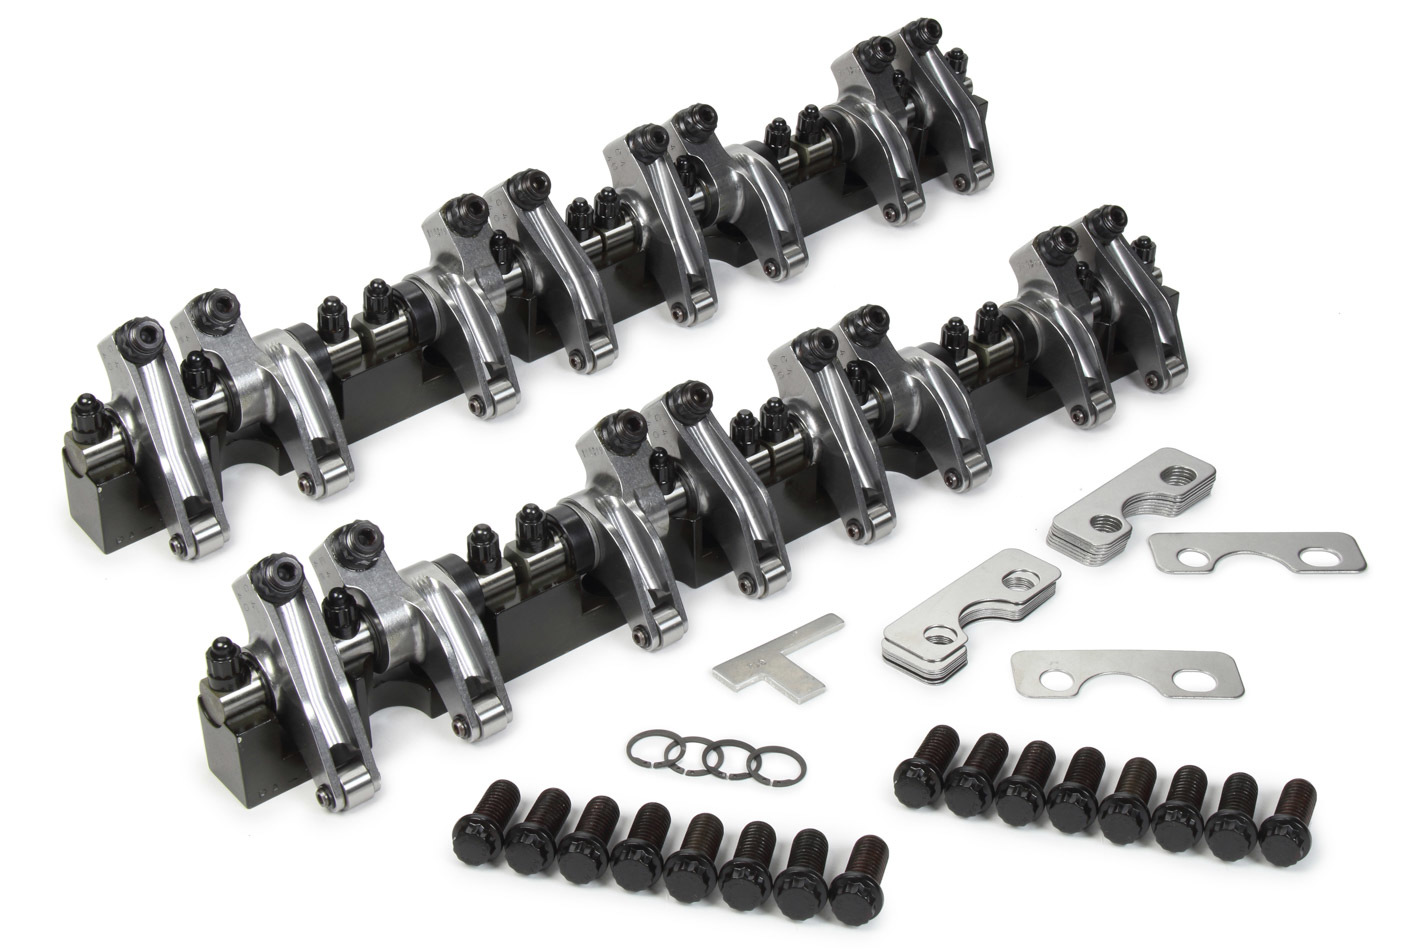 T&D Machine 2126S-165PLUS100/155 Small Block Chevy 13 Degree 1.65/1.55 Ratio Rocker Arm